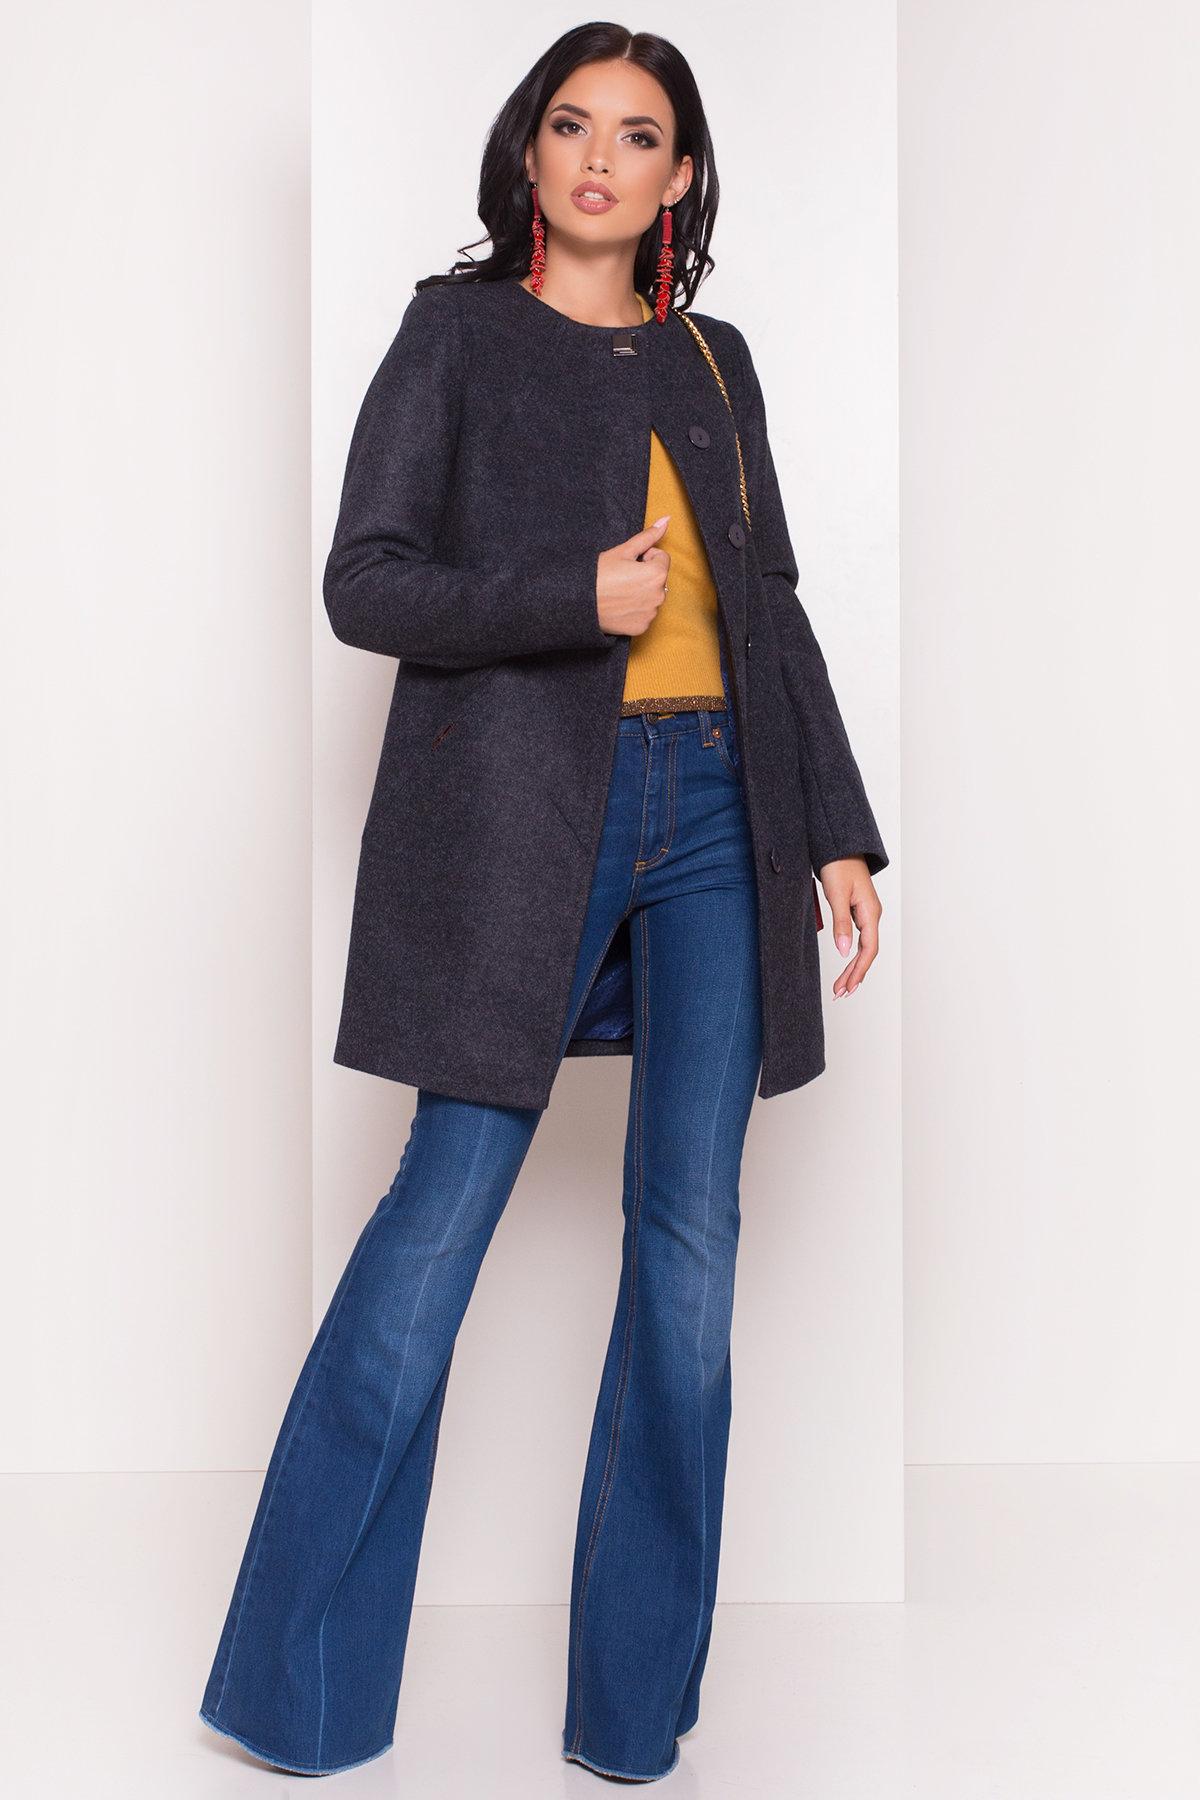 Пальто Шаника 5379 АРТ. 36615 Цвет: Темно-синий - фото 1, интернет магазин tm-modus.ru